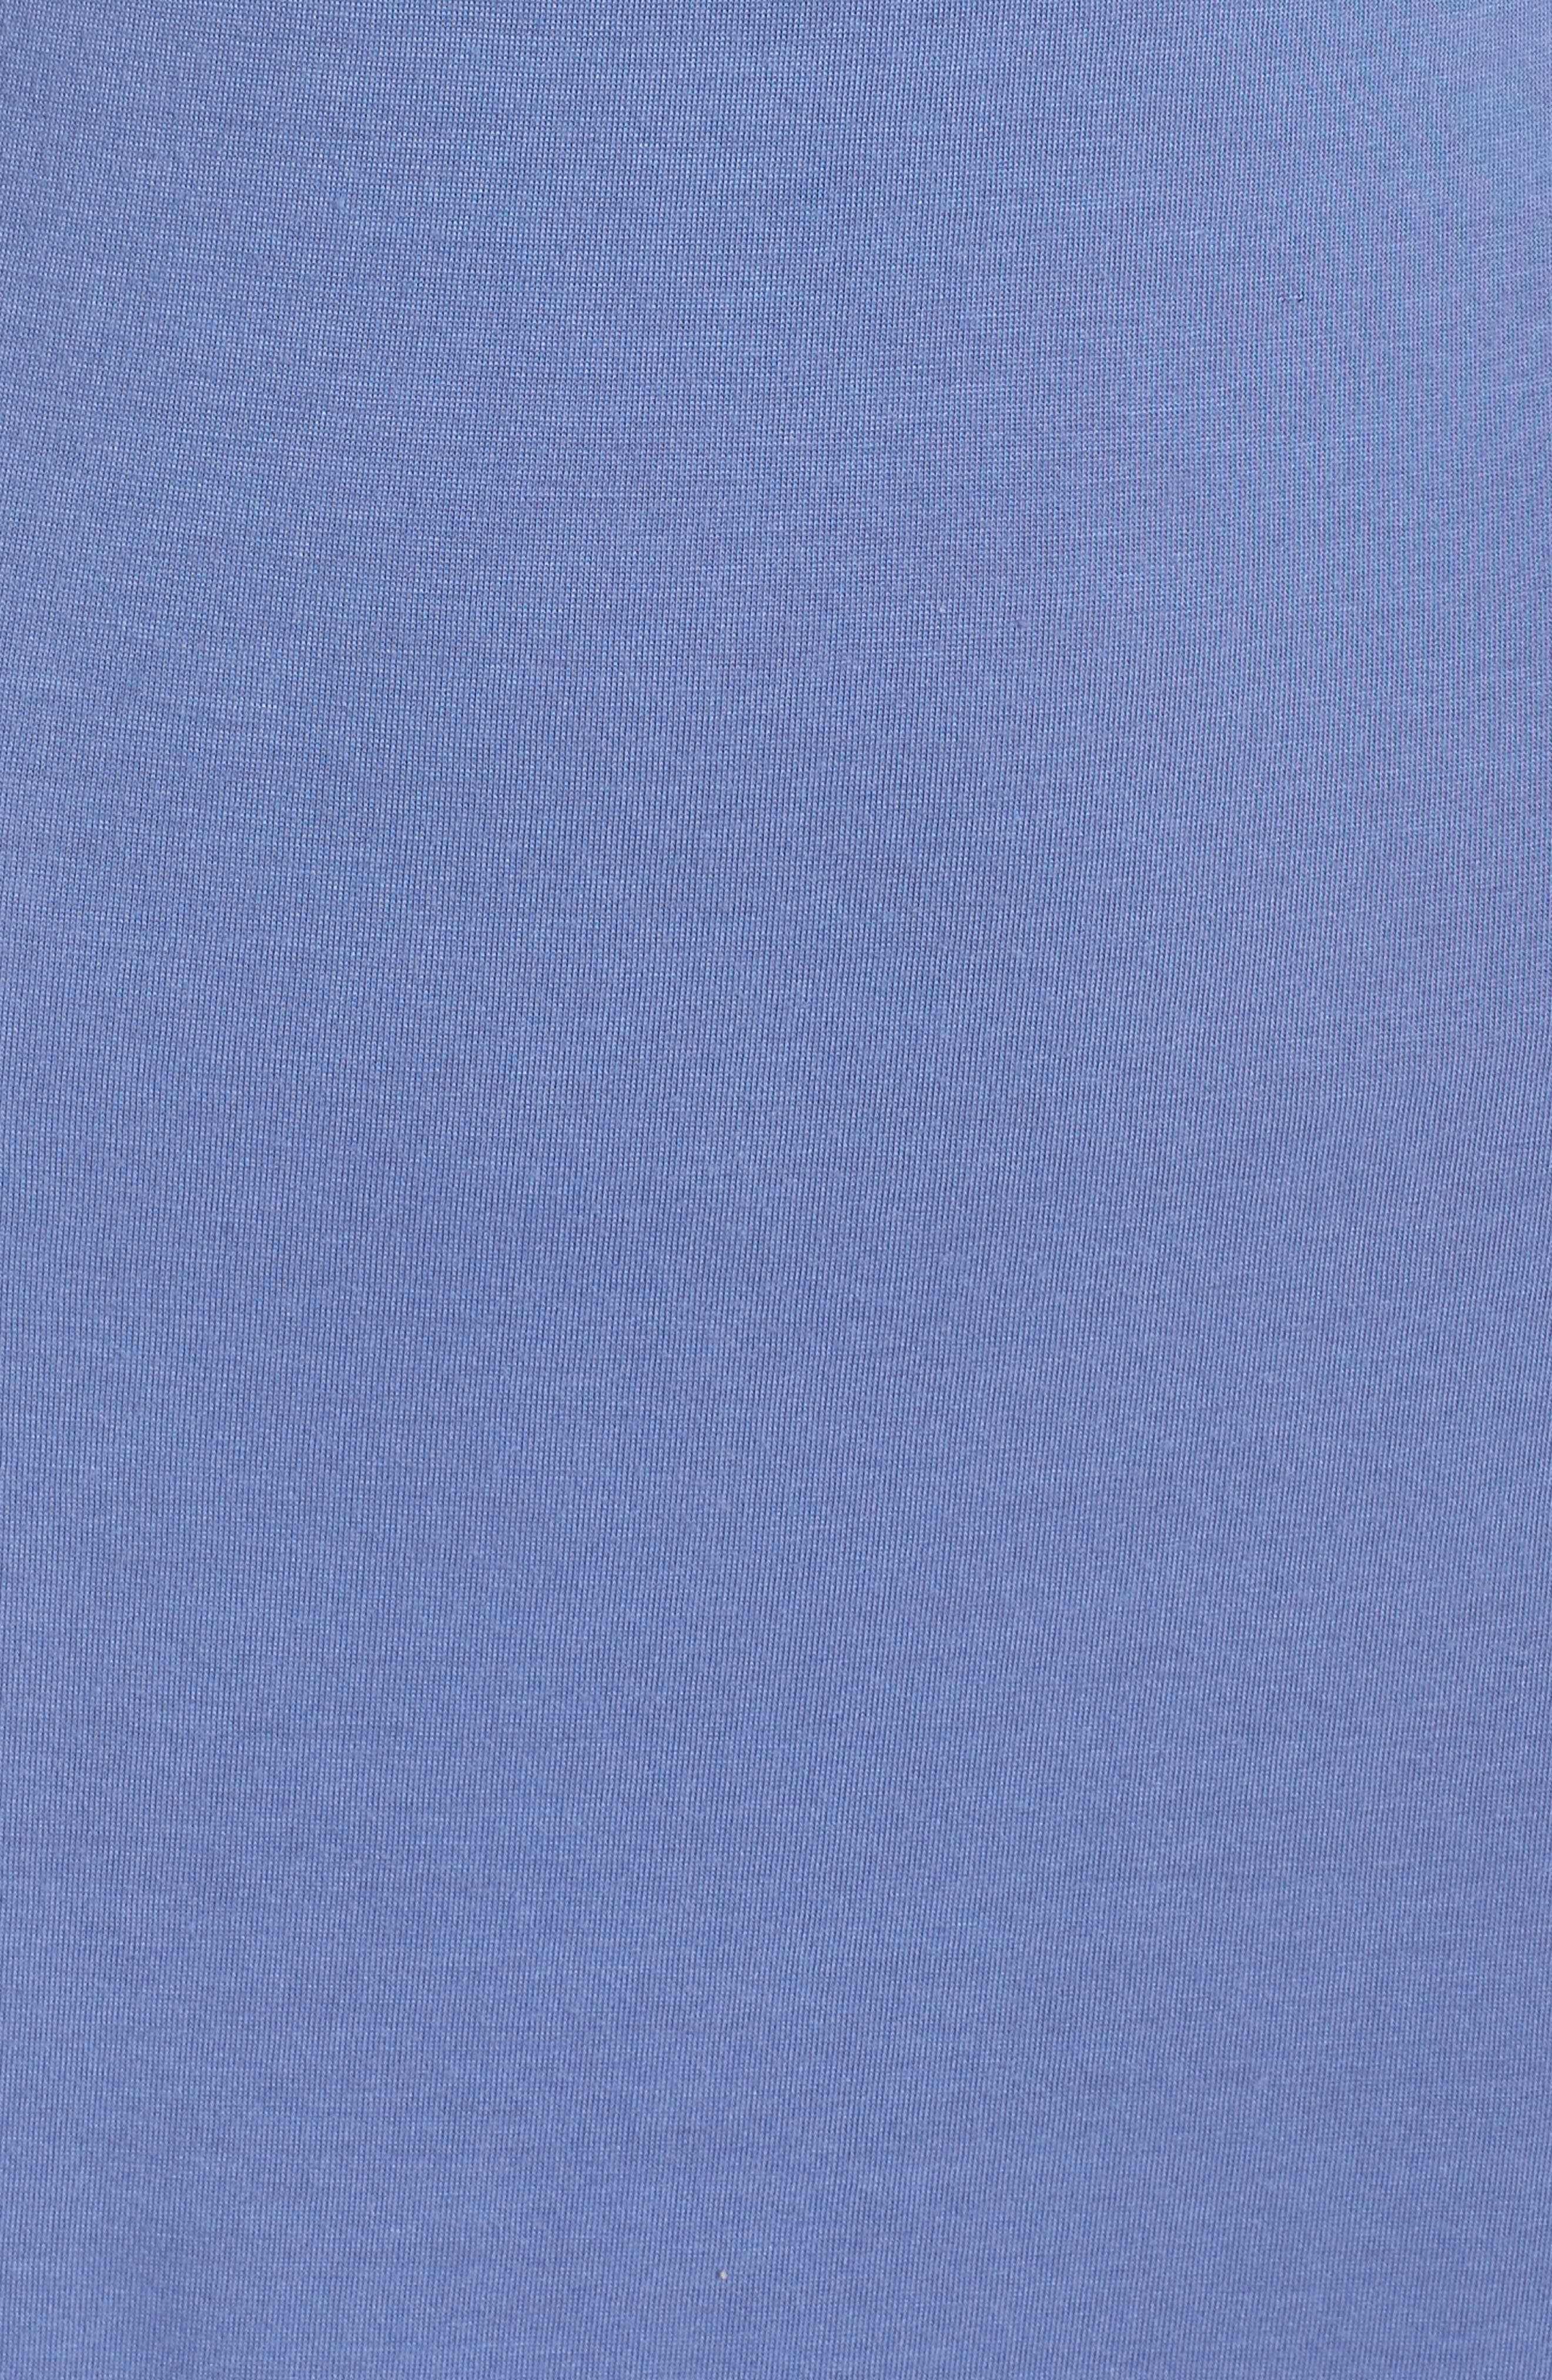 Luxe Shangri-La Nightgown,                             Alternate thumbnail 5, color,                             Wedgewood